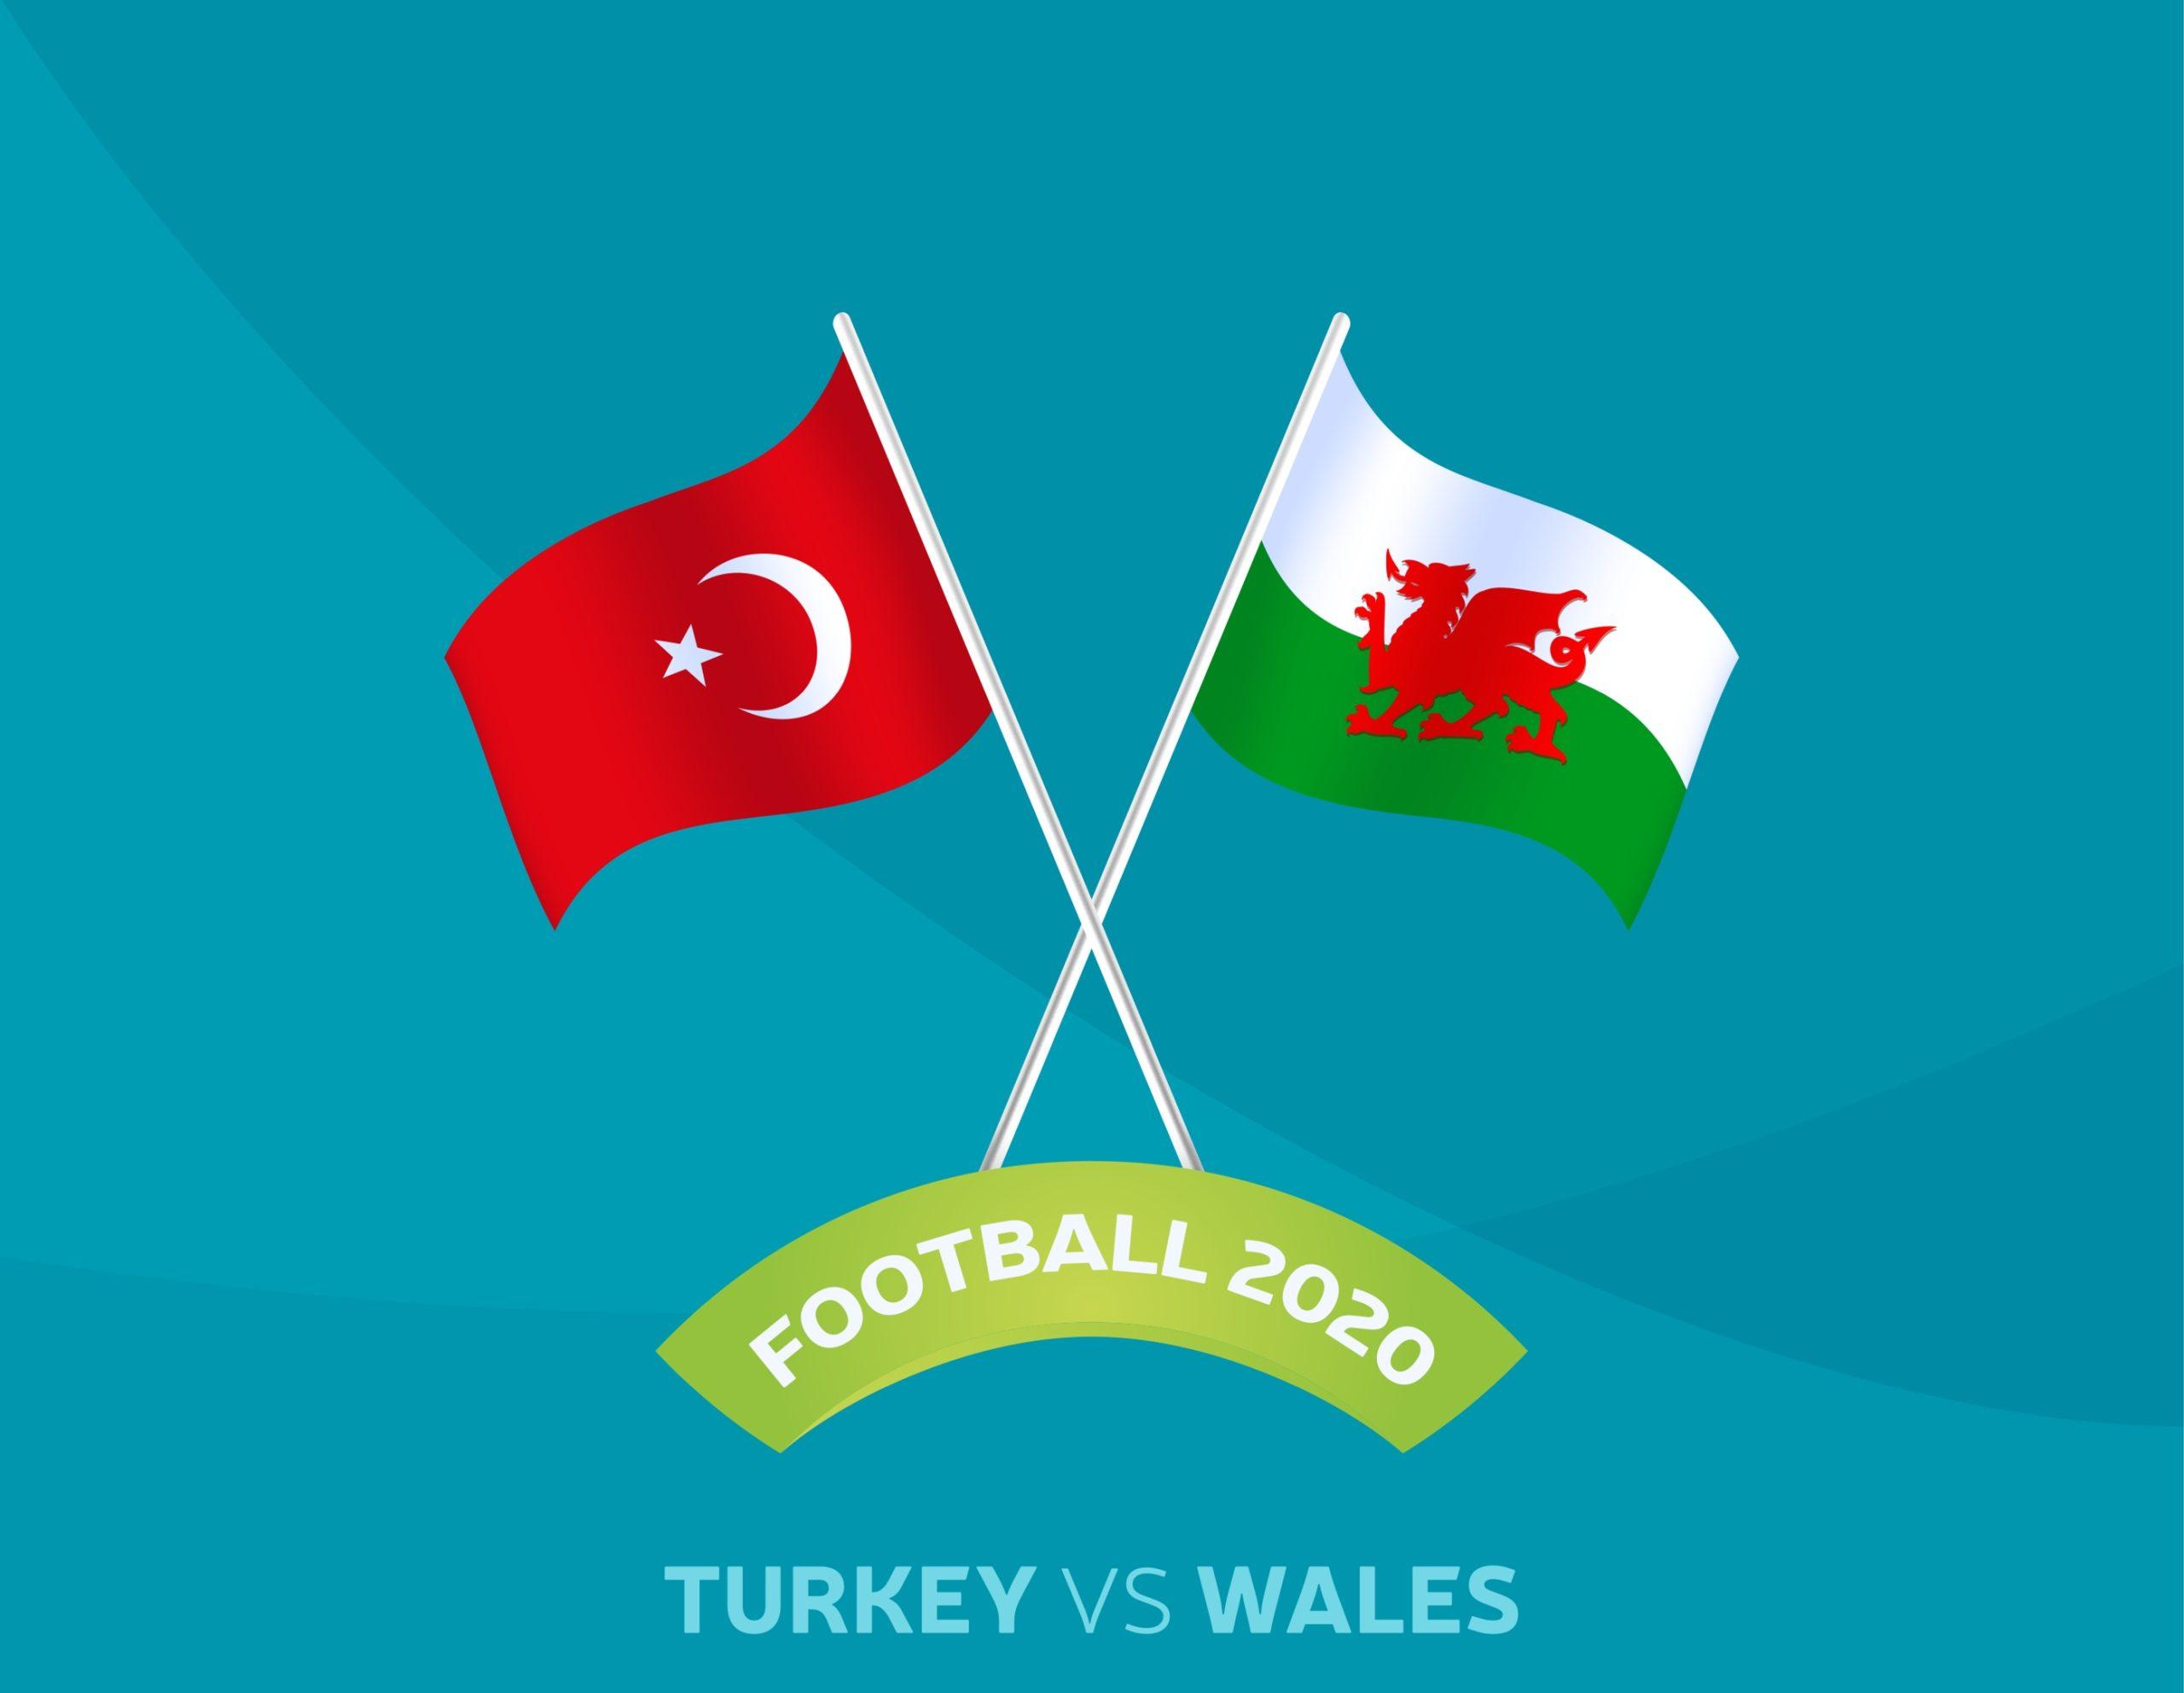 Turkey vs Wales Flags